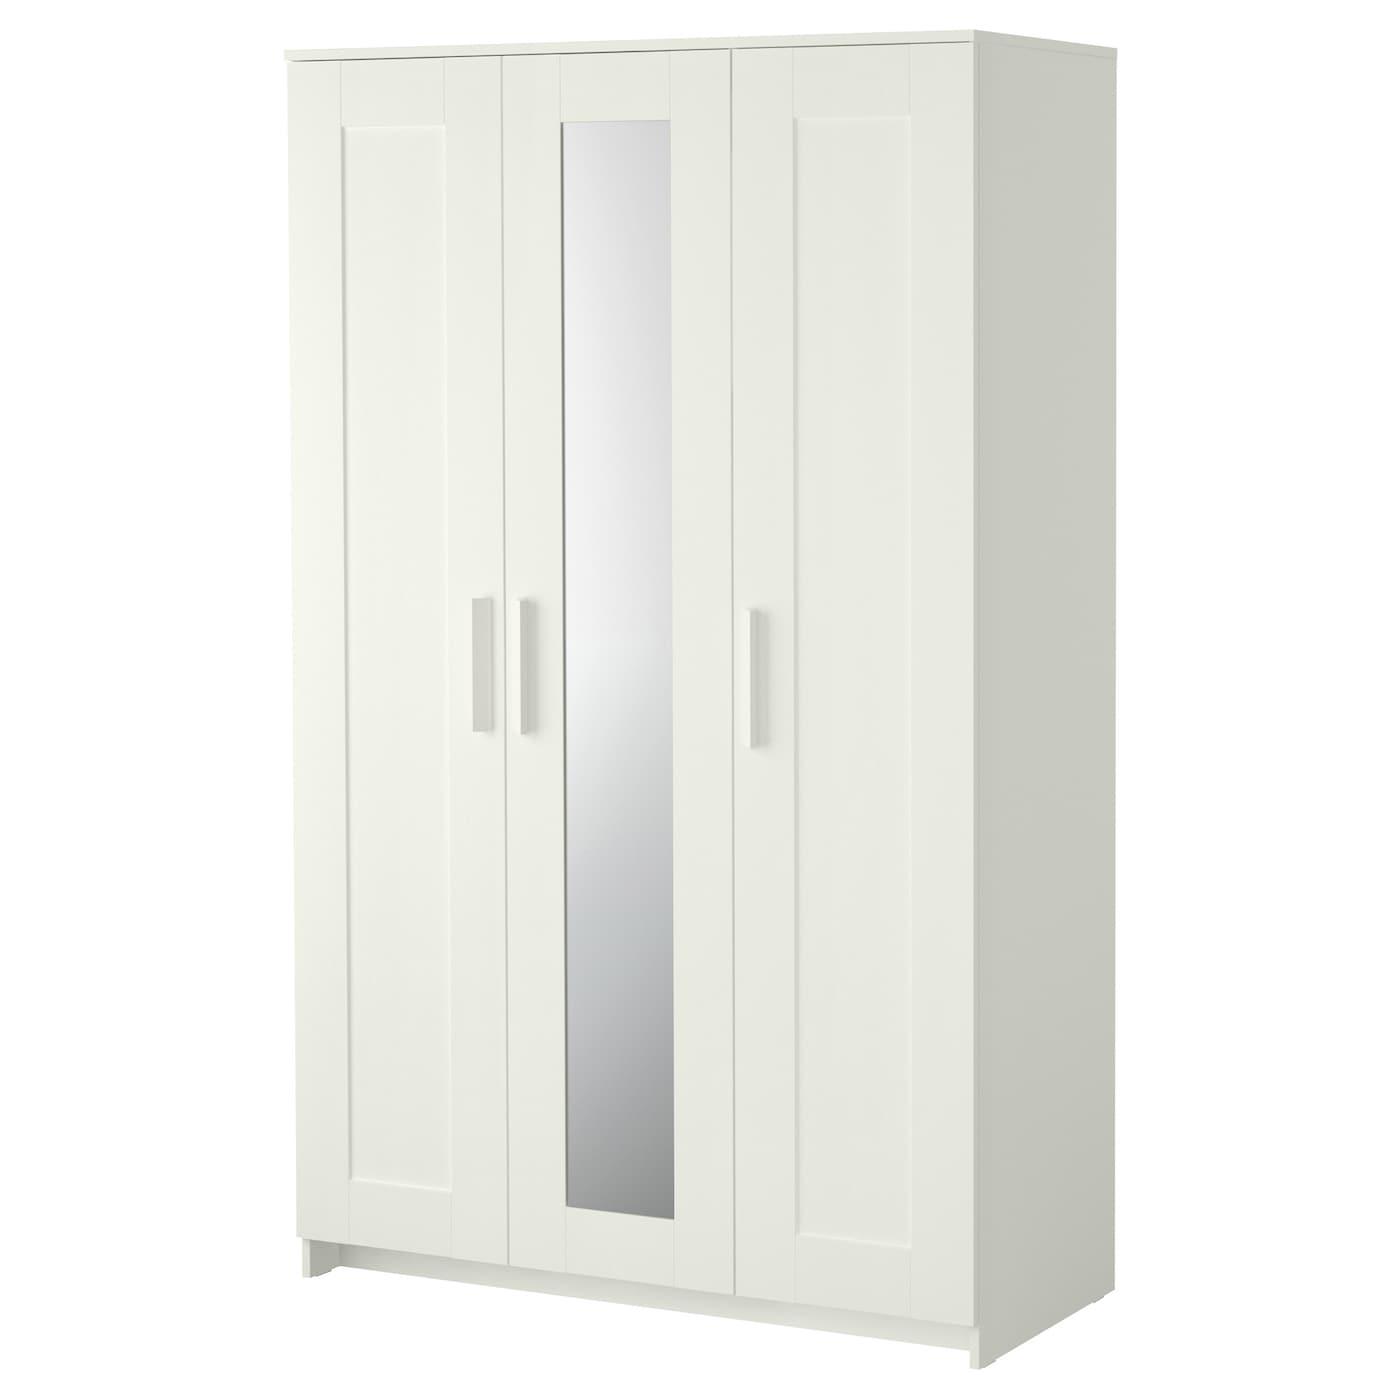 Porte Laque Blanc Ikea brimnes armoire 3 portes - blanc 117x190 cm